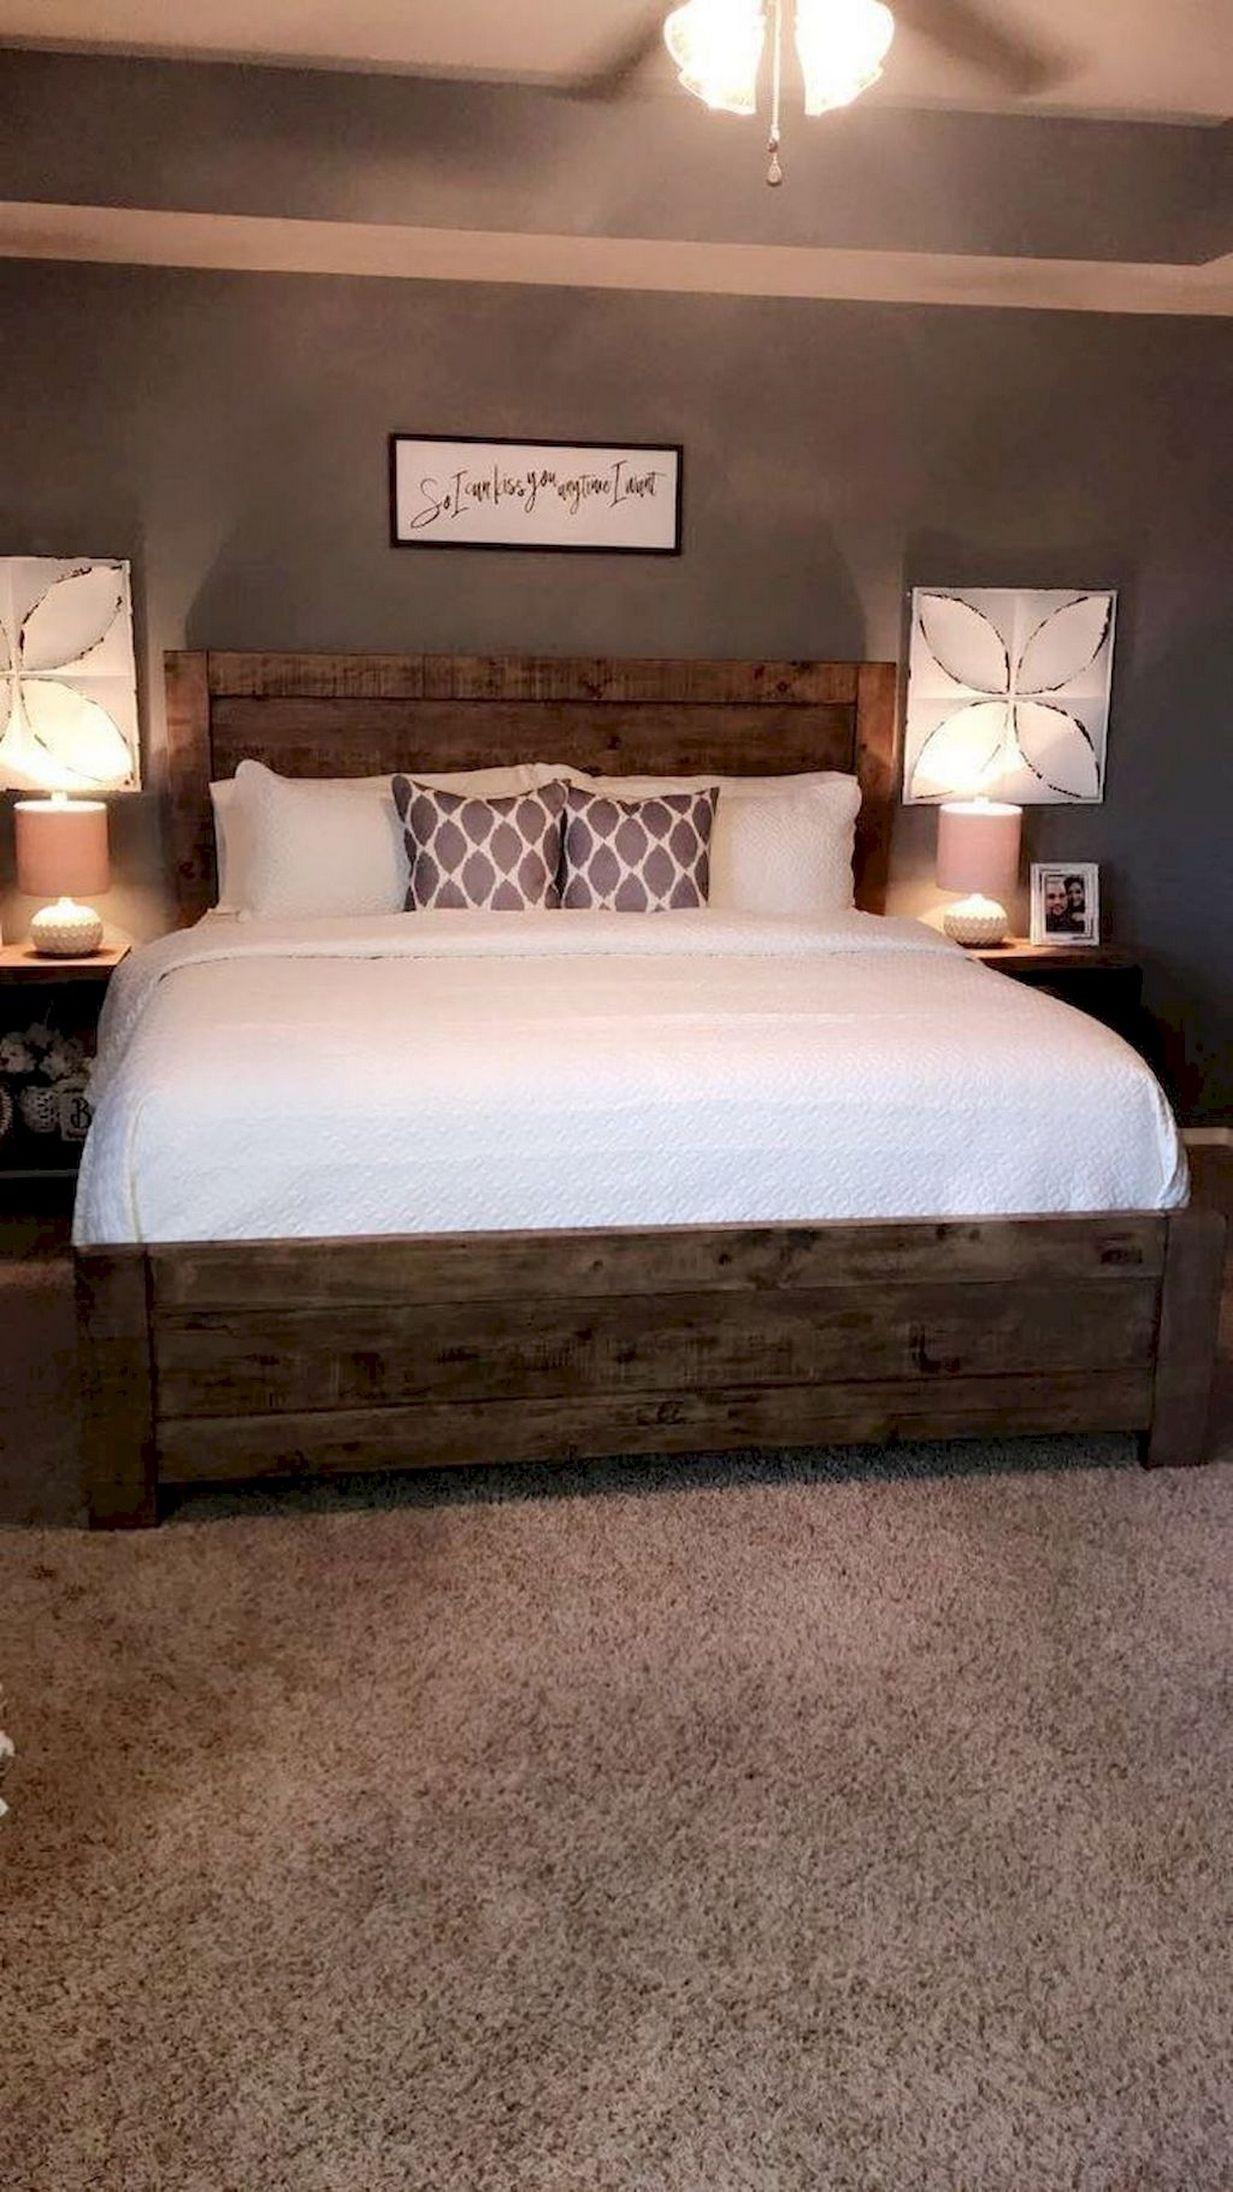 53 Comfortable Master Bedroom Decorating Ideas For Inspiration For The Master Bedroom Decor Of Your Home Farm House Living Room Master Bedrooms Decor Bedroom Design